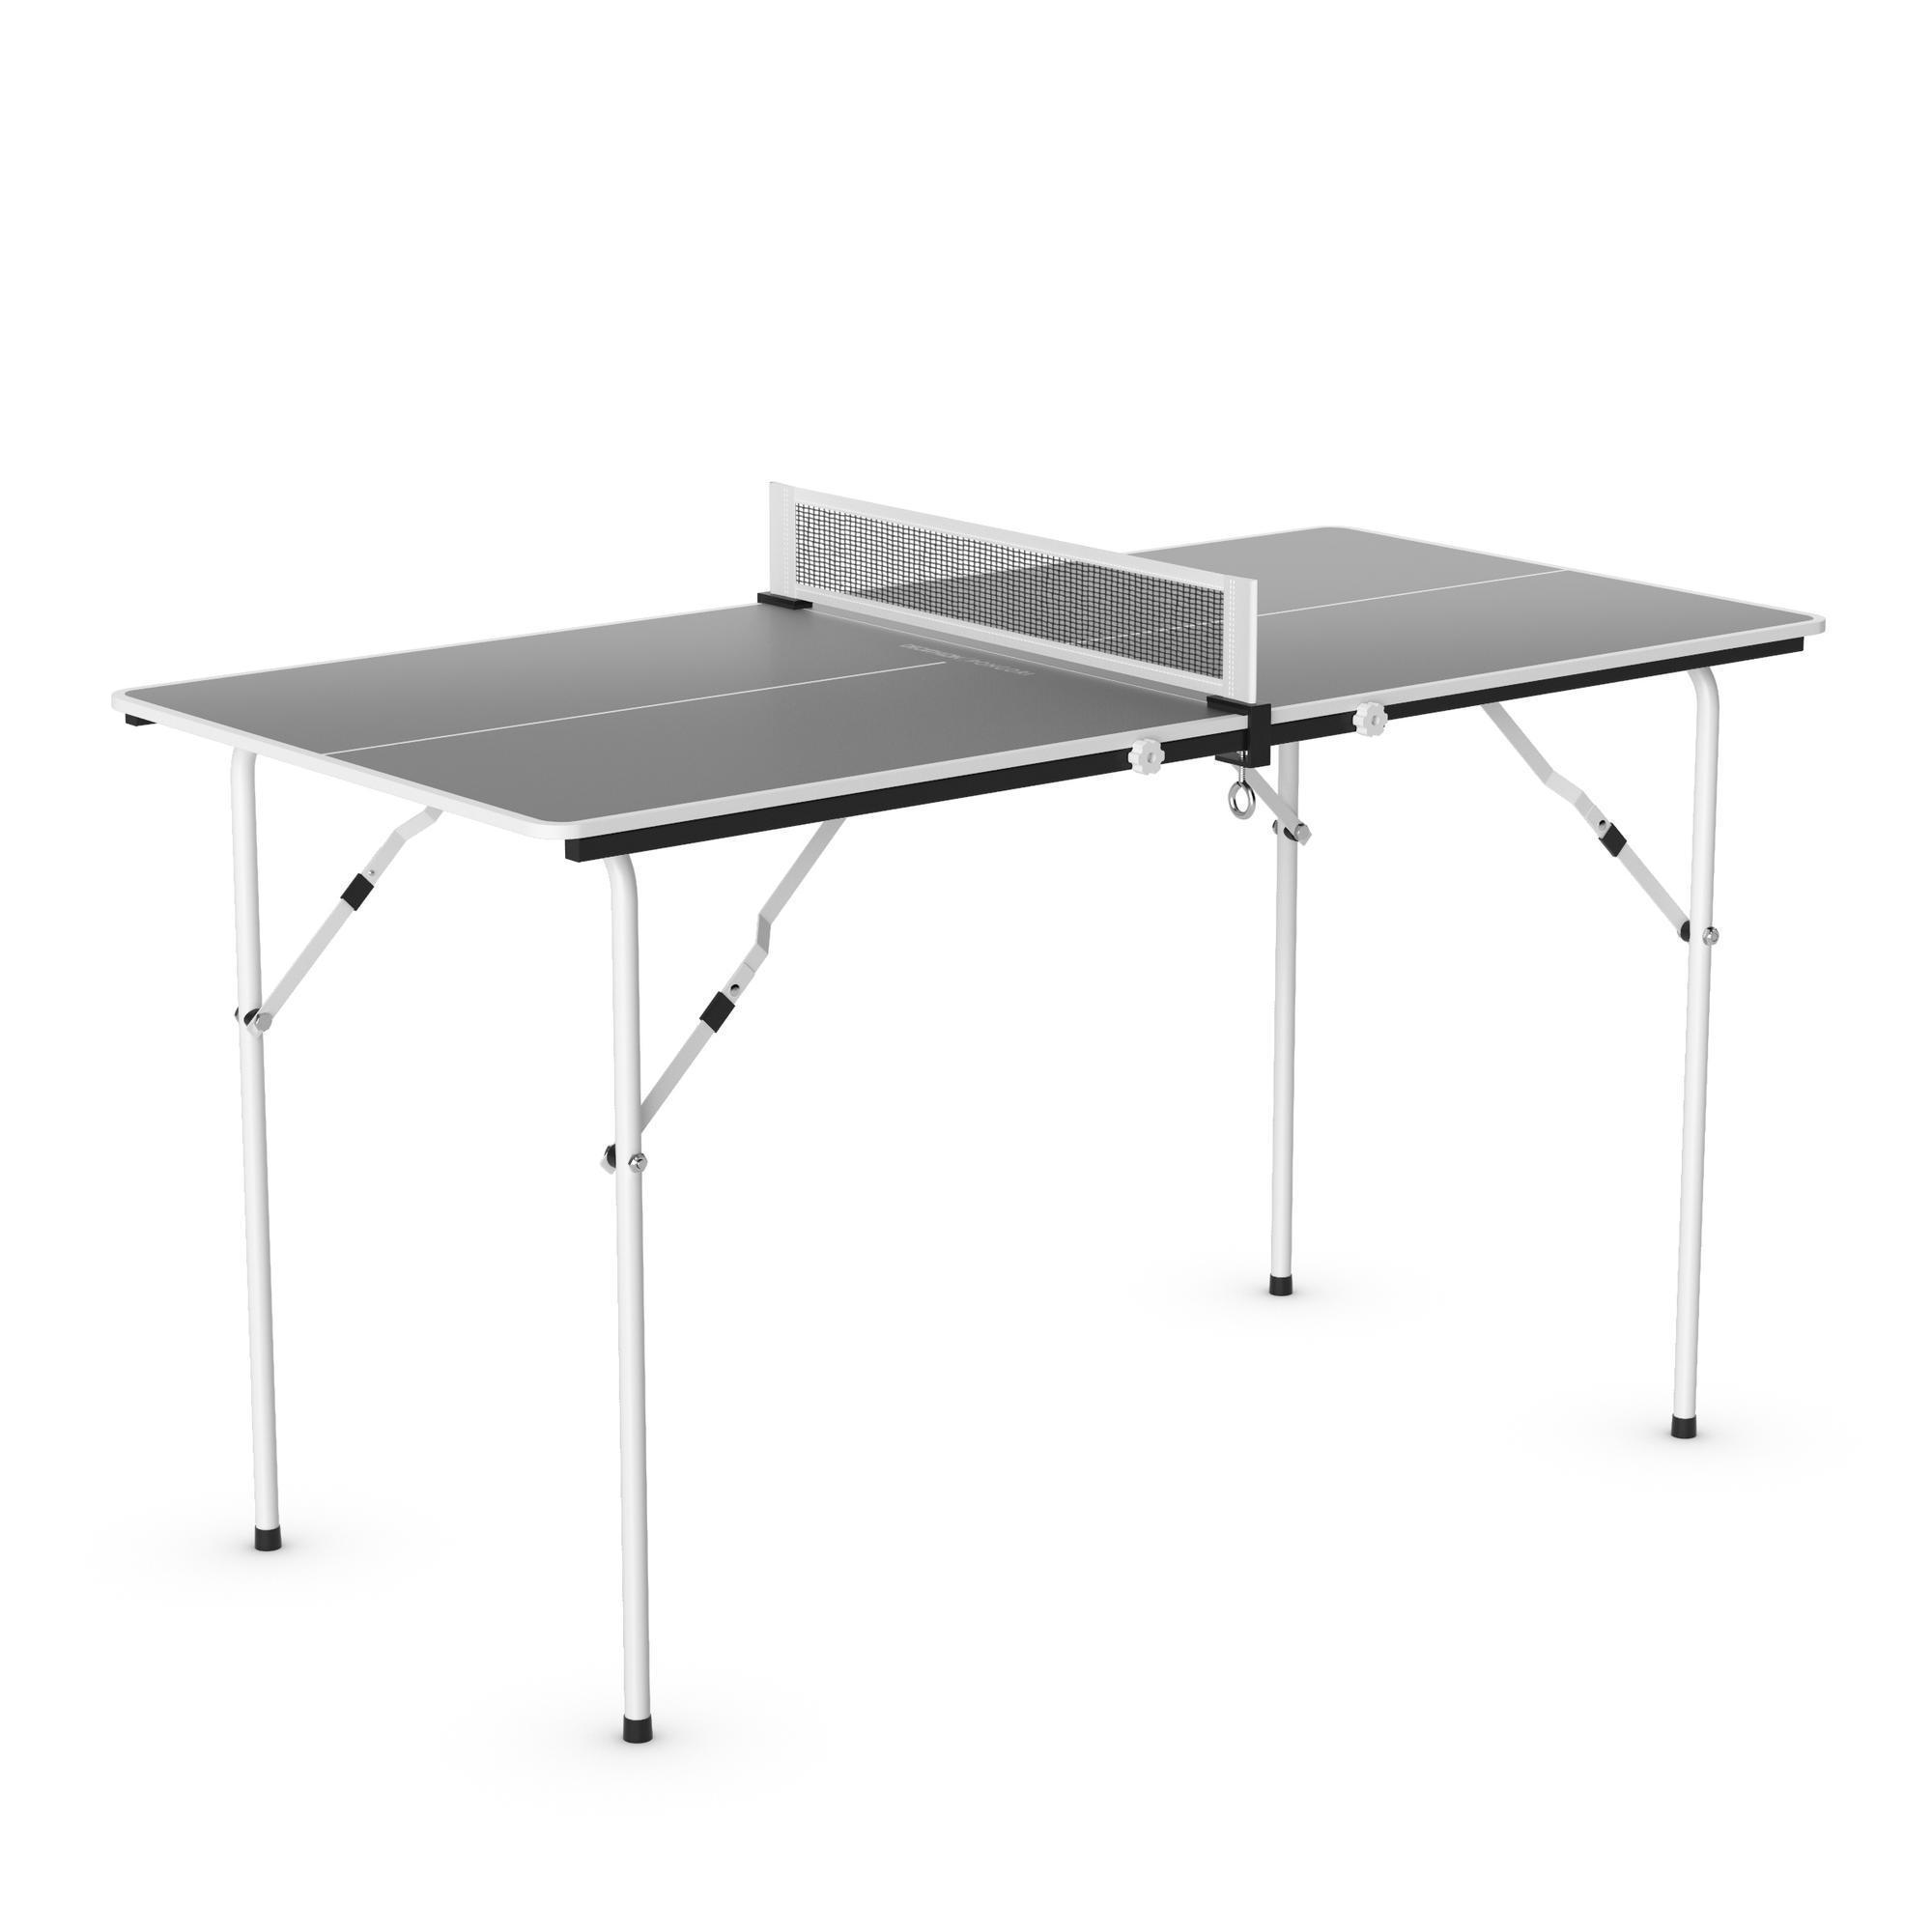 Tavolo ping pong PPT 130 SMALL indoor PONGORI   DECATHLON